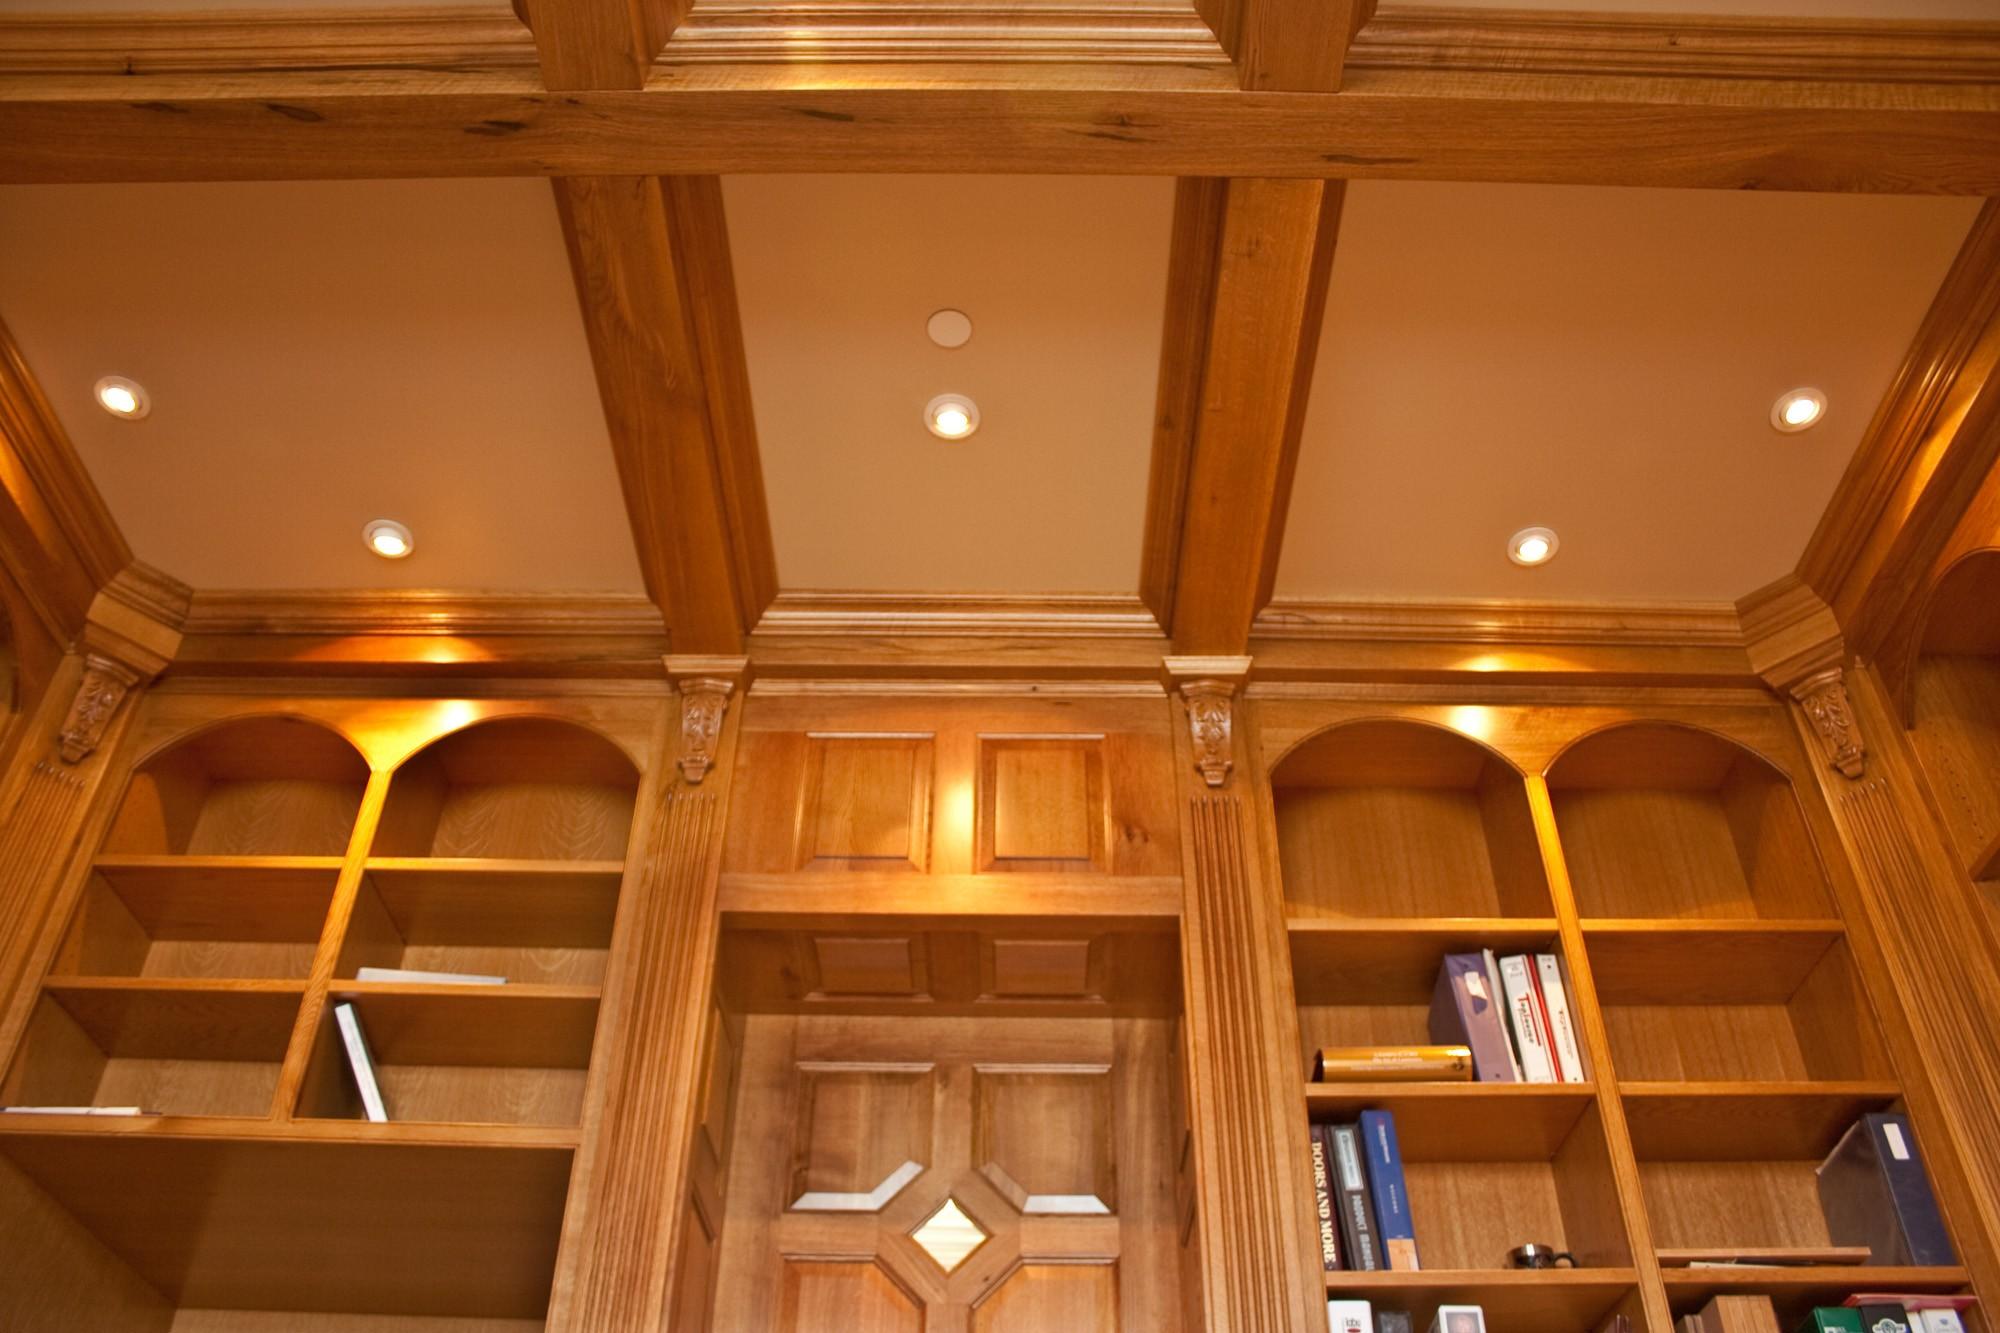 Panel quarter sawn white oak interior door craftsman interior doors - Woodharbor Quarter Sawn White Oak Kitchen Cabinet Door Finishes